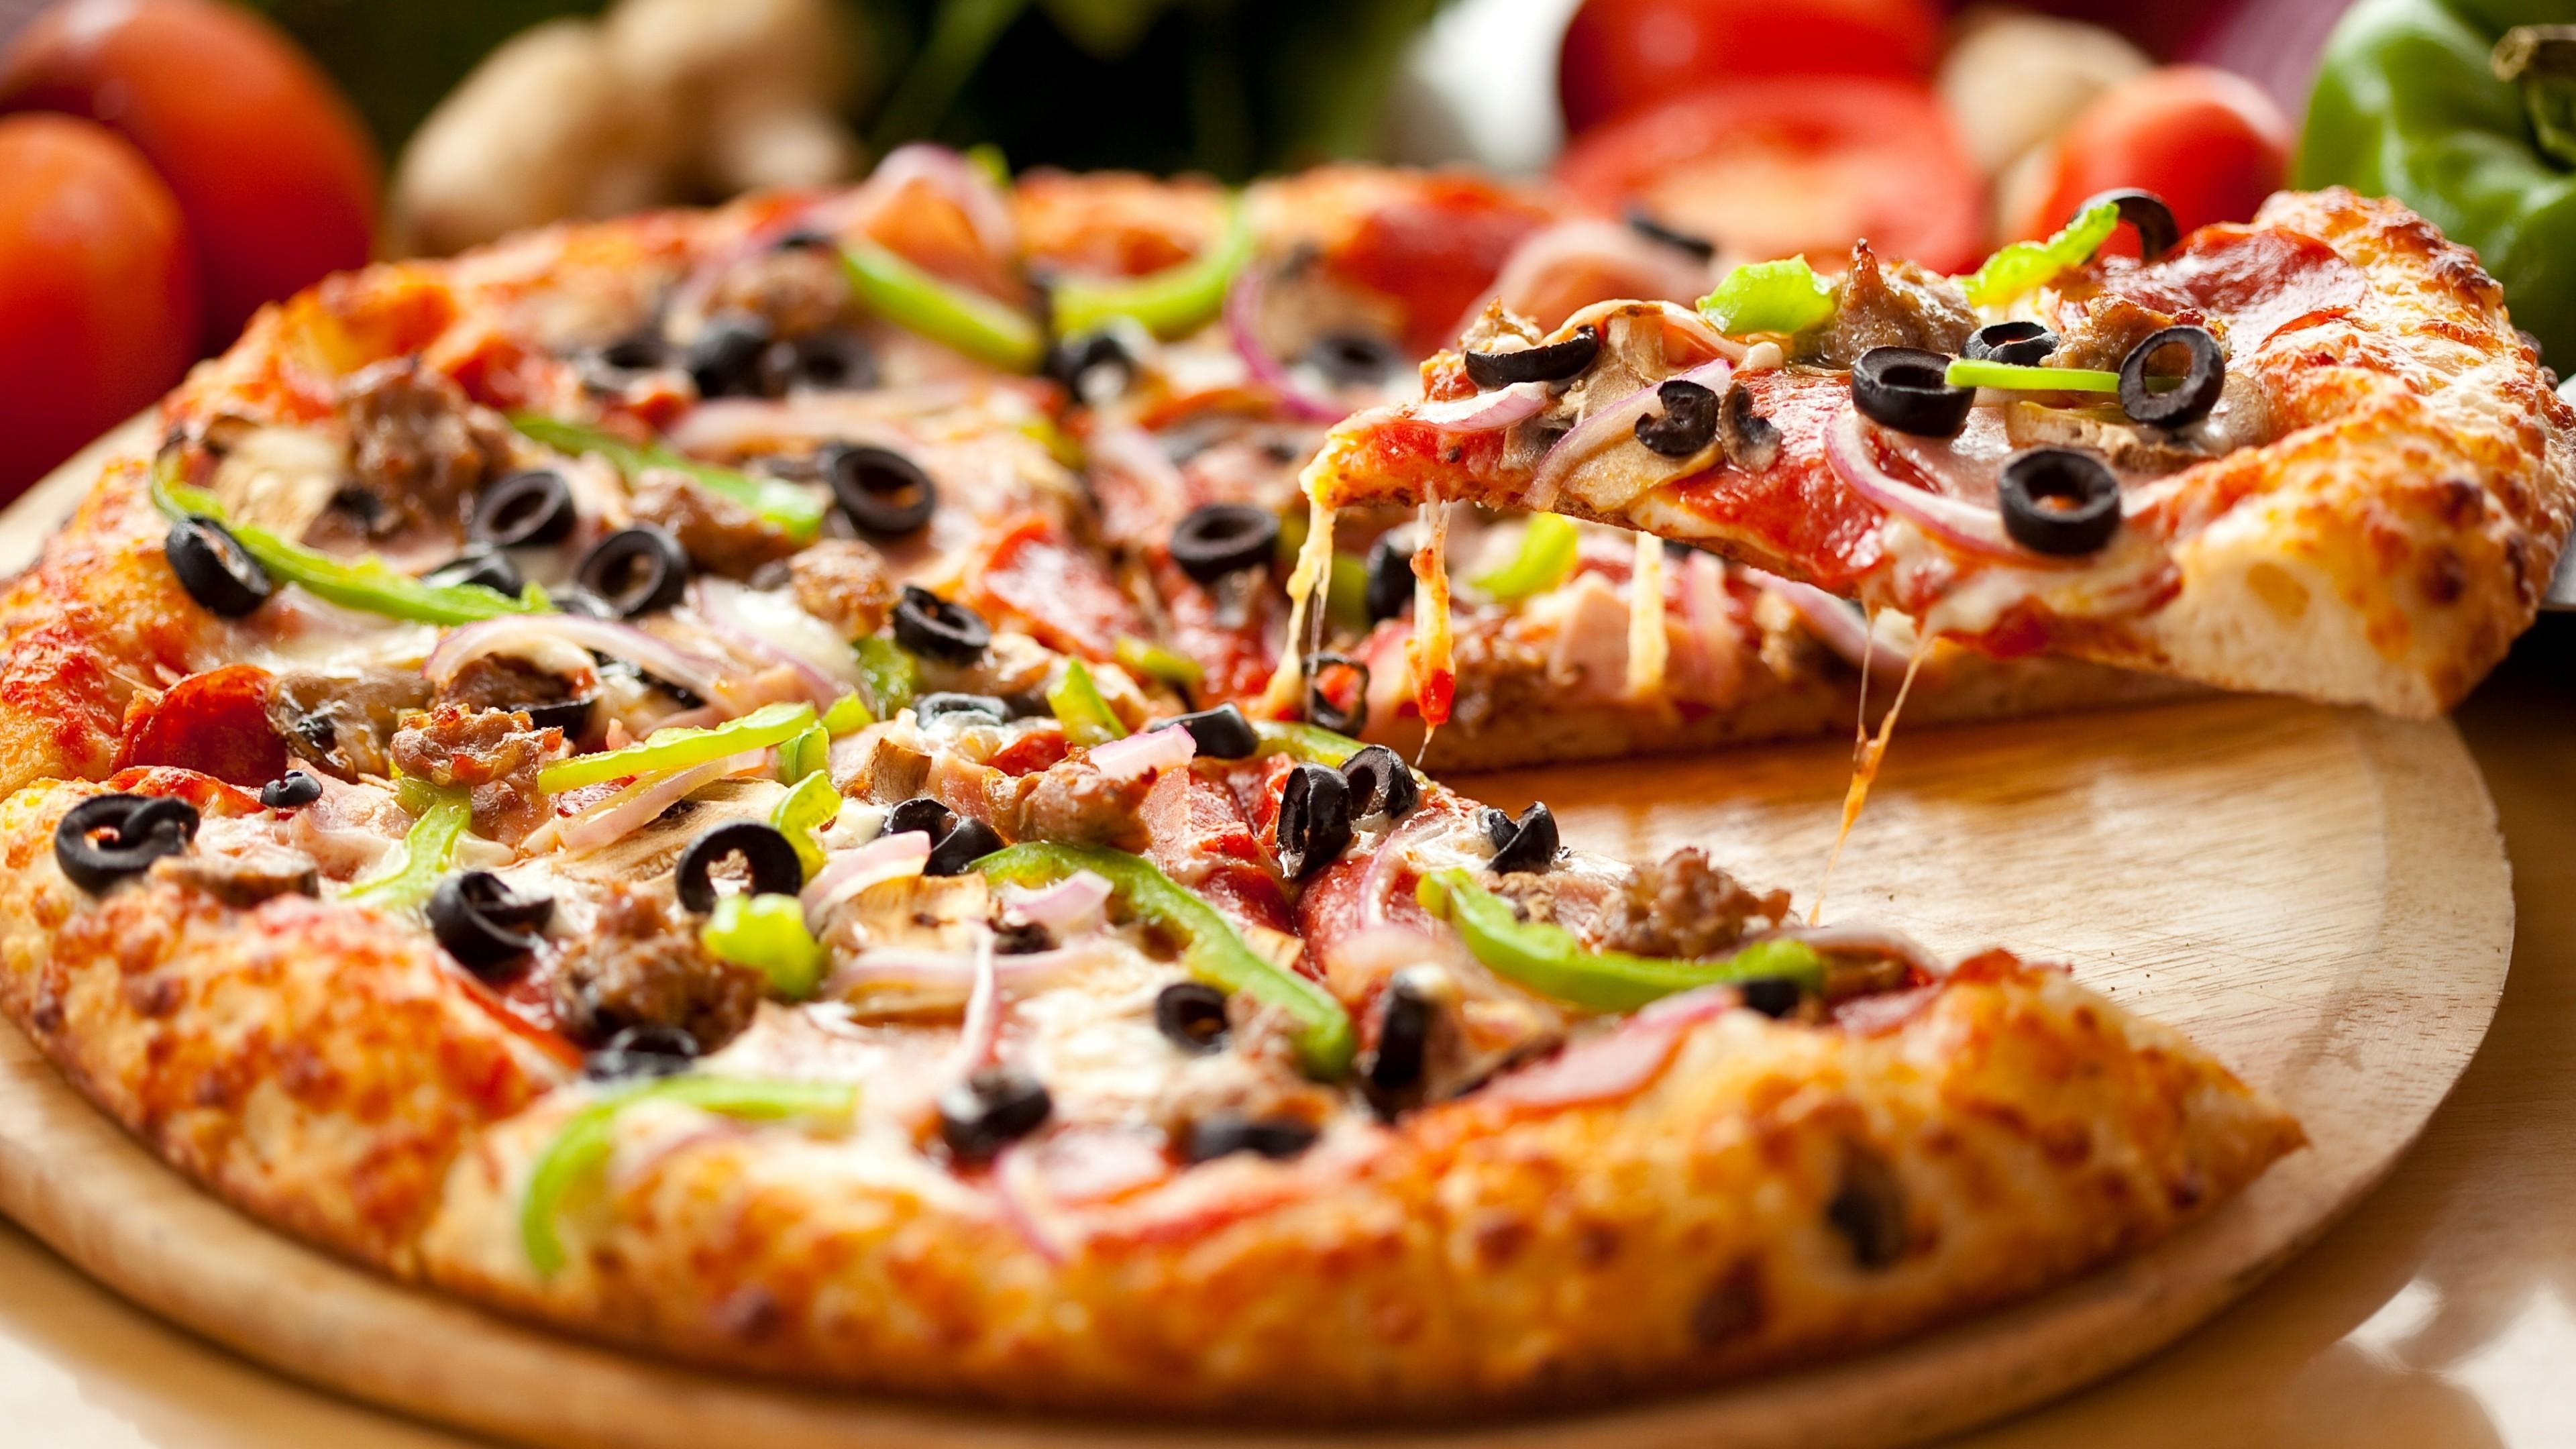 food meat pizza cuisine dish produce salt cured meat italian food european food pizza cheese tarte